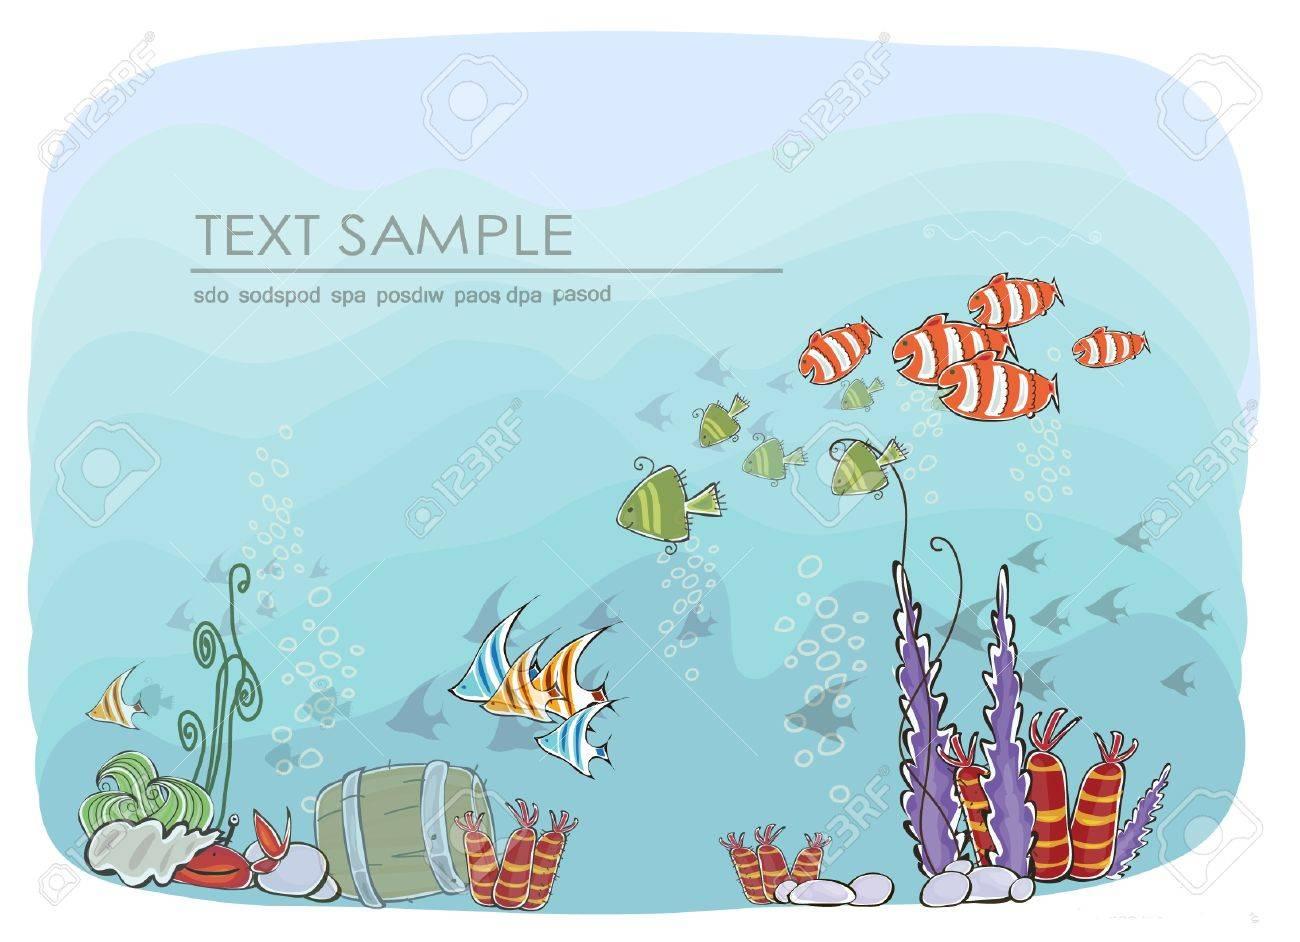 under the sea backdround Stock Vector - 15339890